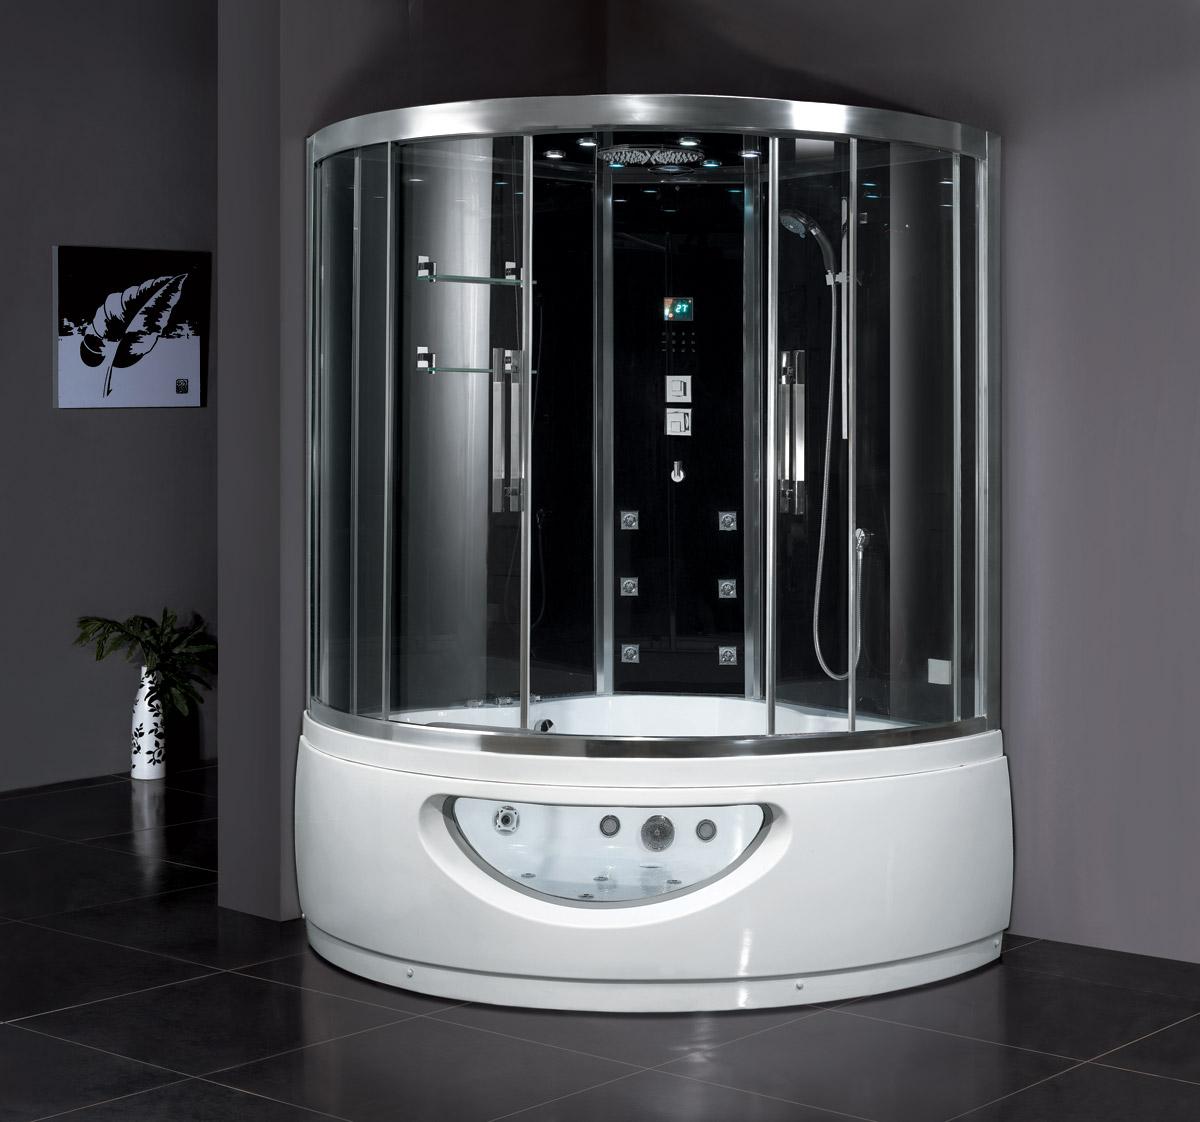 Claudius Steam Shower with Whirlpool Bathtub